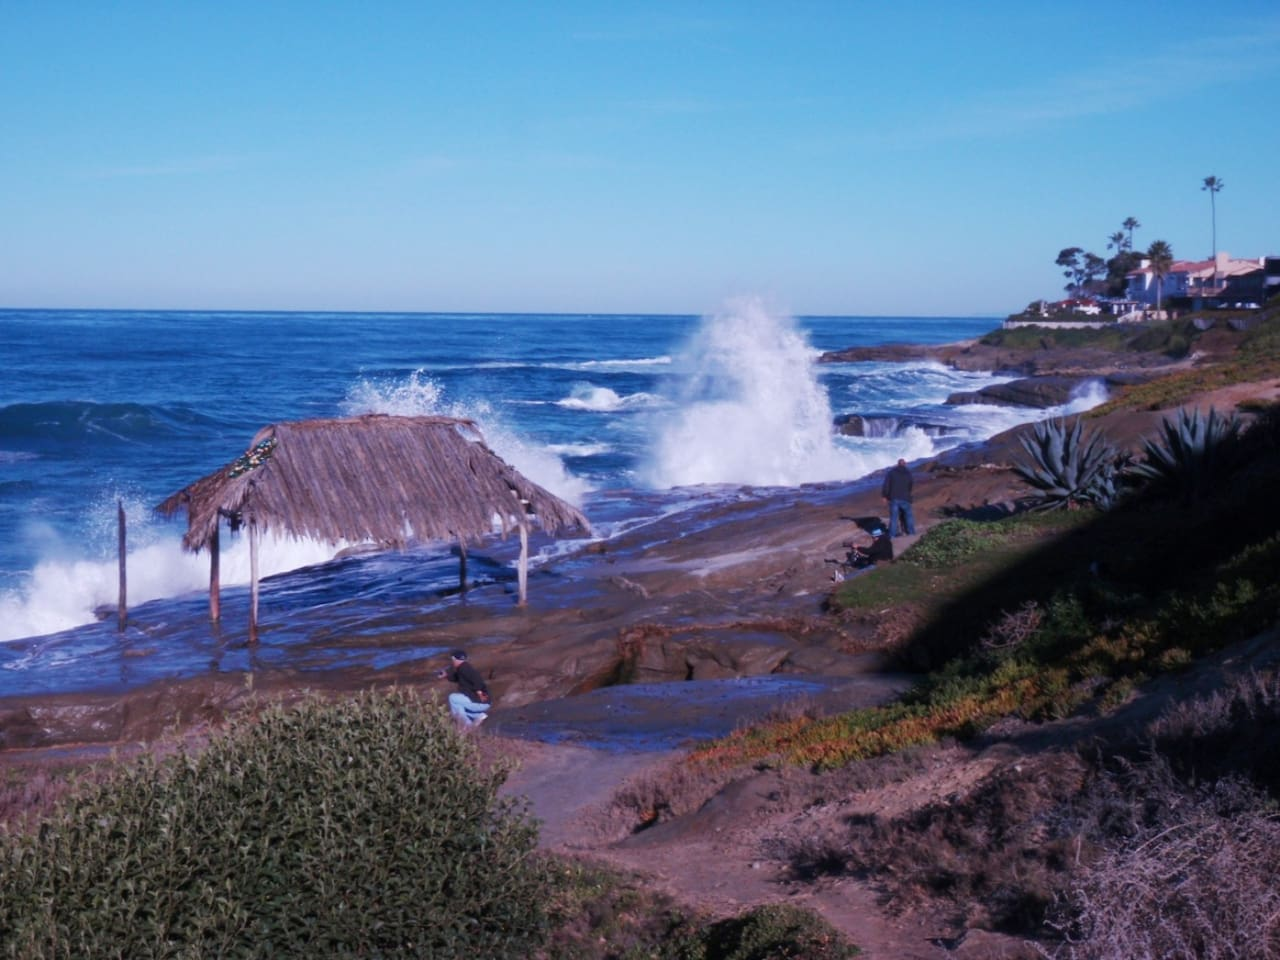 Wind and Sea Beach